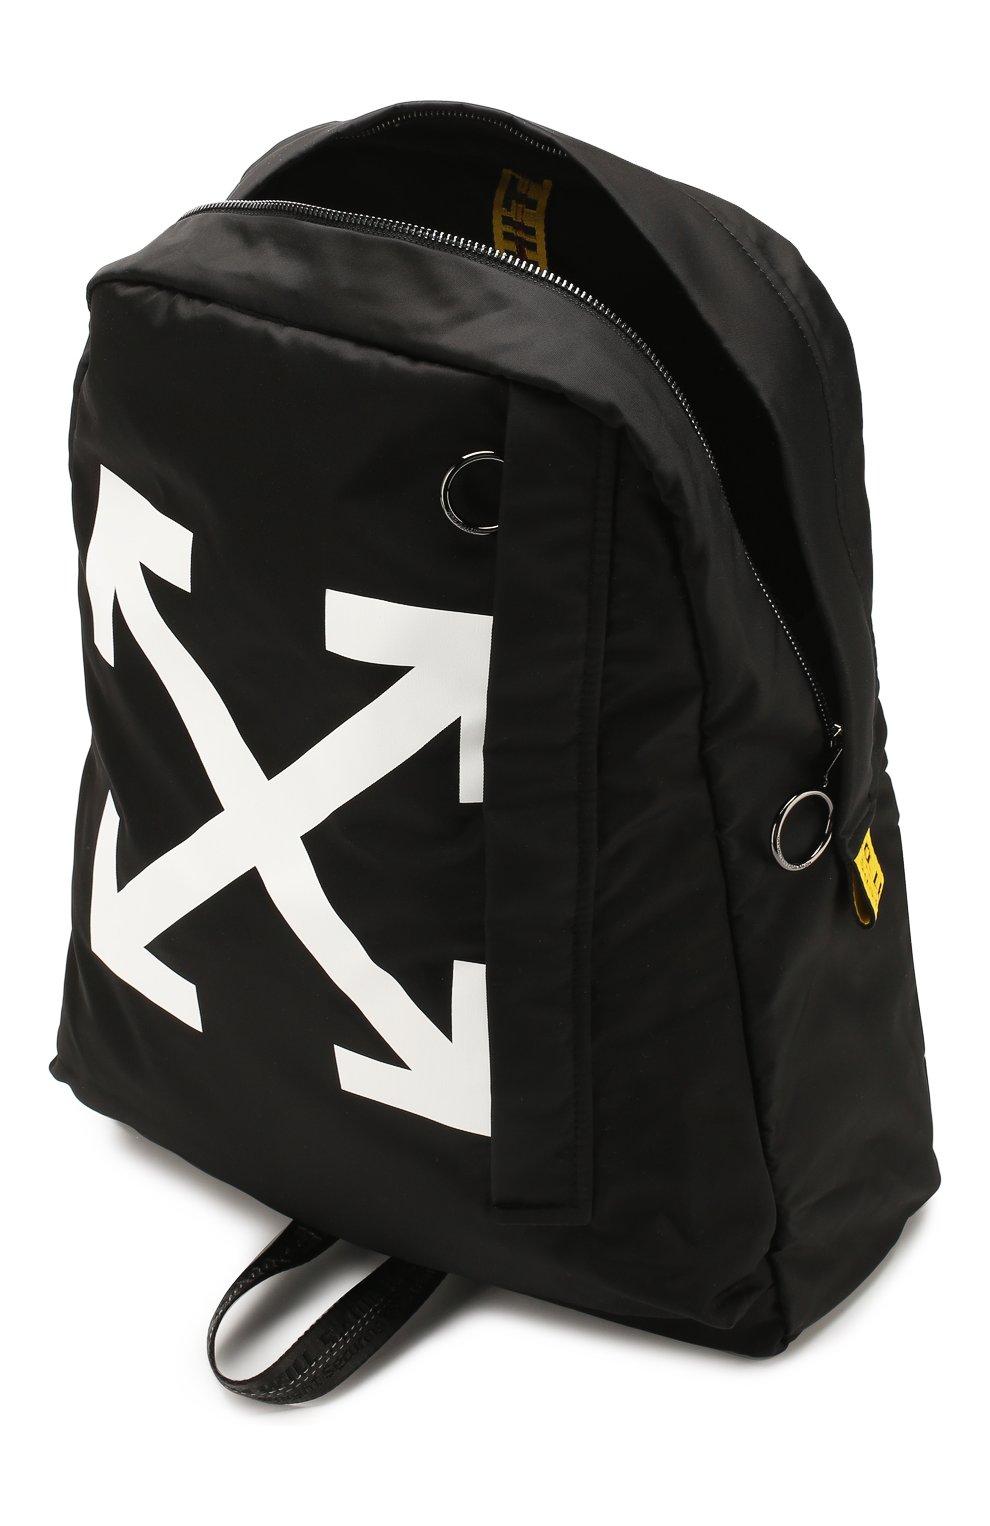 Мужской текстильный рюкзак OFF-WHITE черного цвета, арт. 0MNB019R20E480231001 | Фото 4